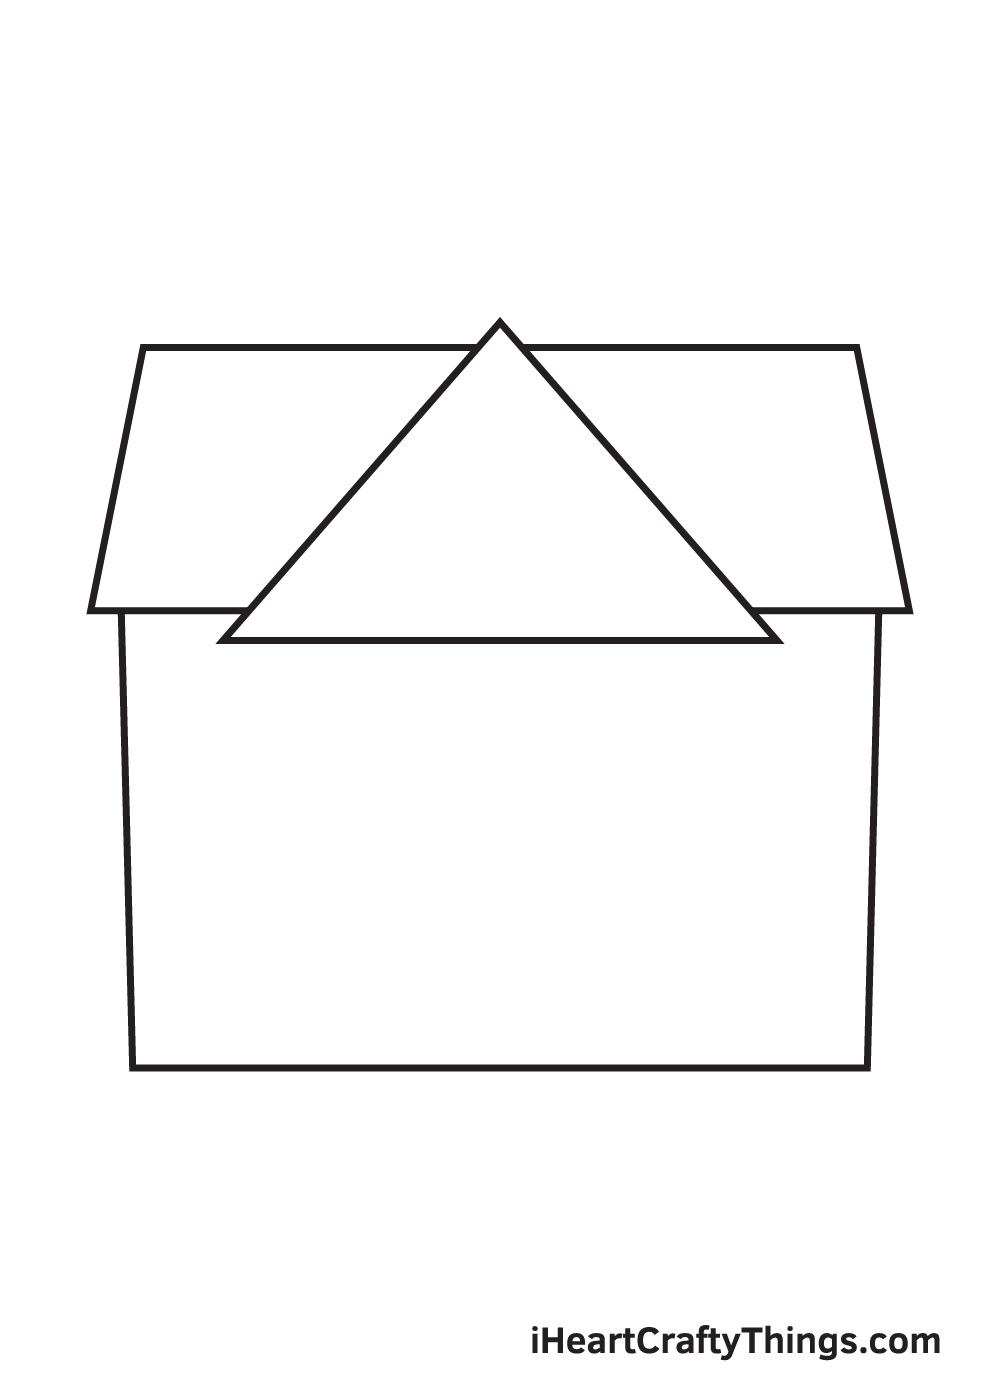 school drawing step 3